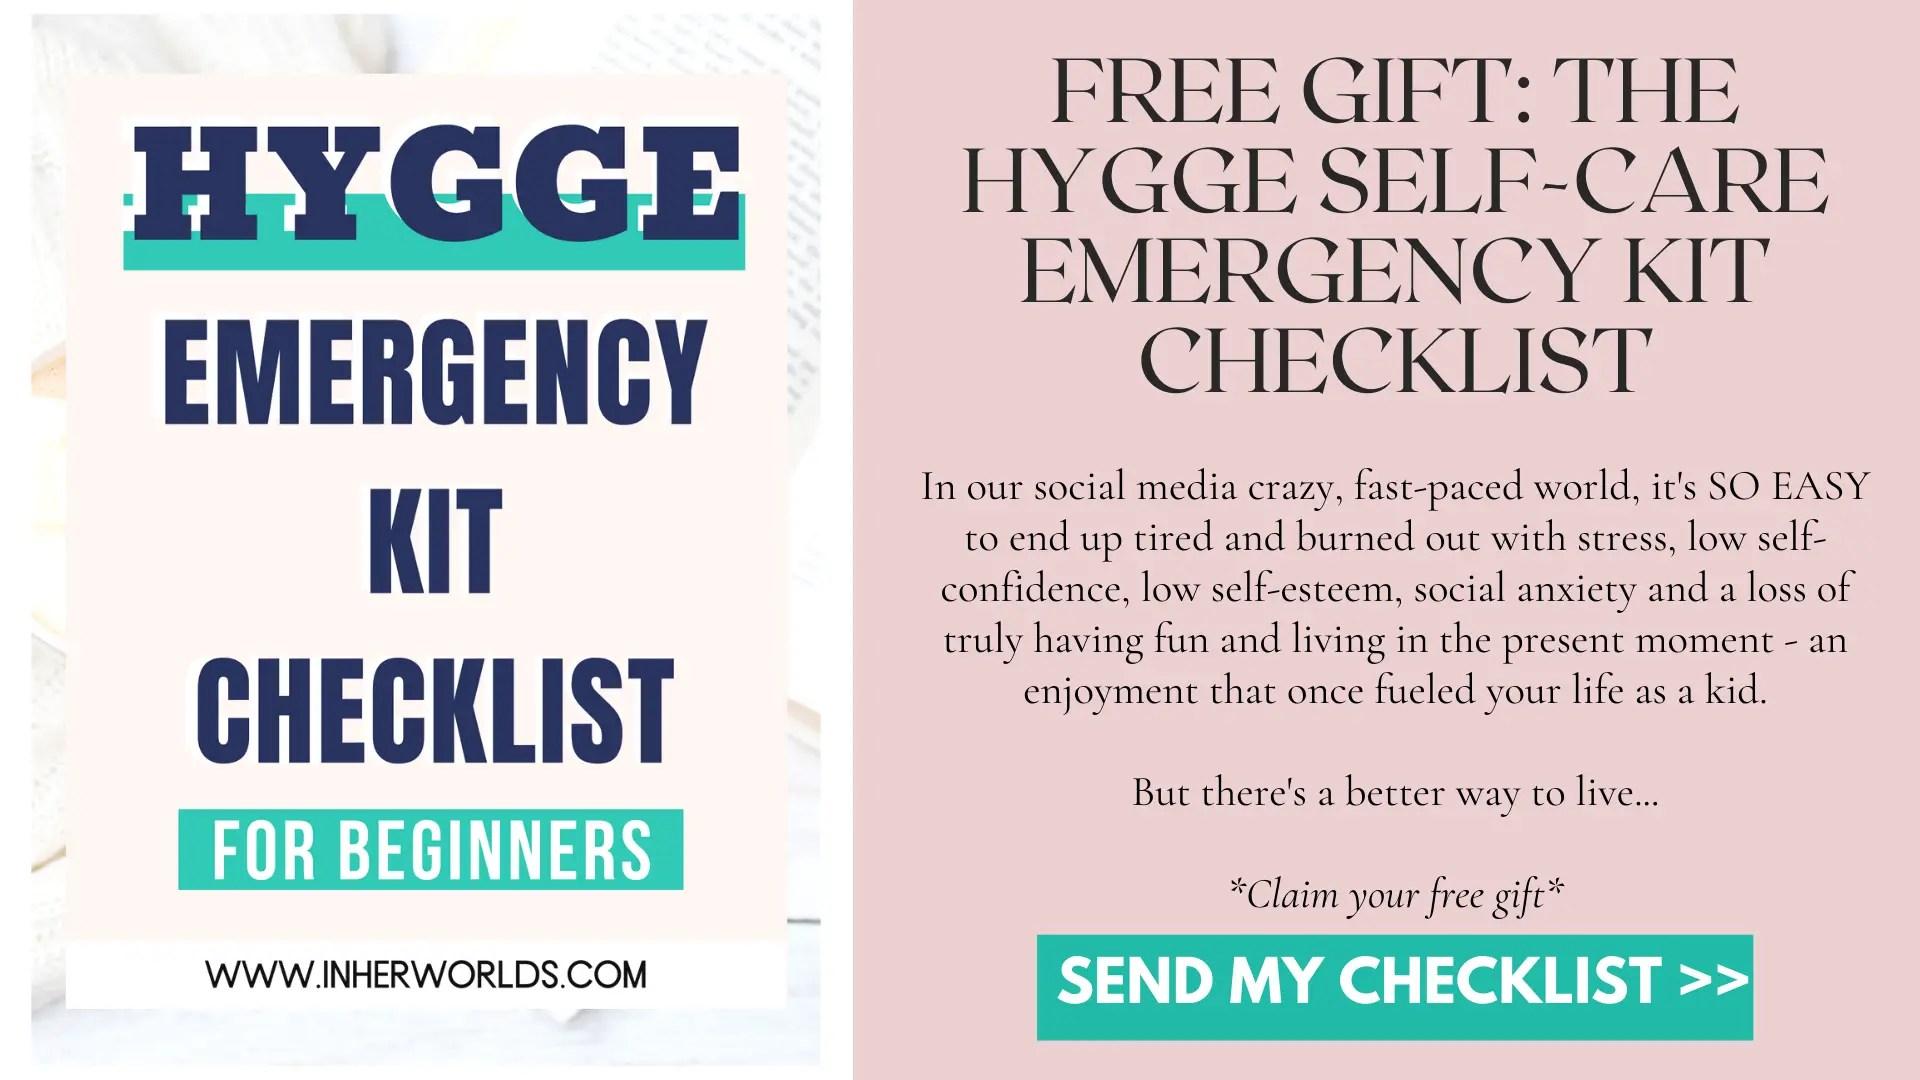 Hygge Self-Care Emergency Kit Checklist